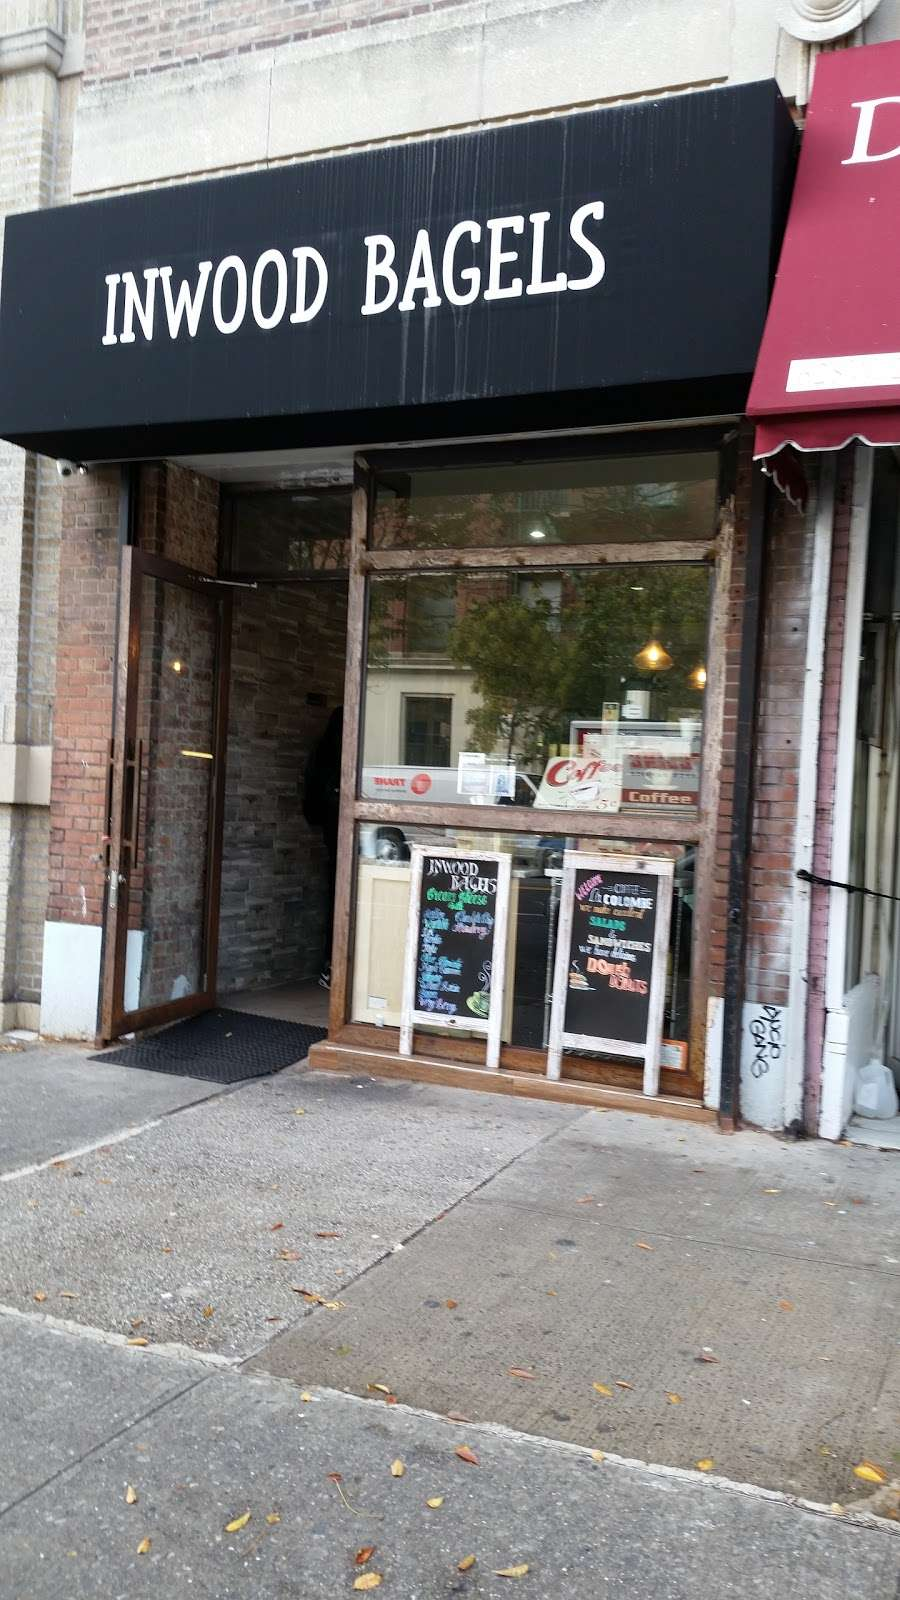 Inwood Bagels - bakery  | Photo 4 of 9 | Address: 628 W 207th St, New York, NY 10034, USA | Phone: (212) 569-7770